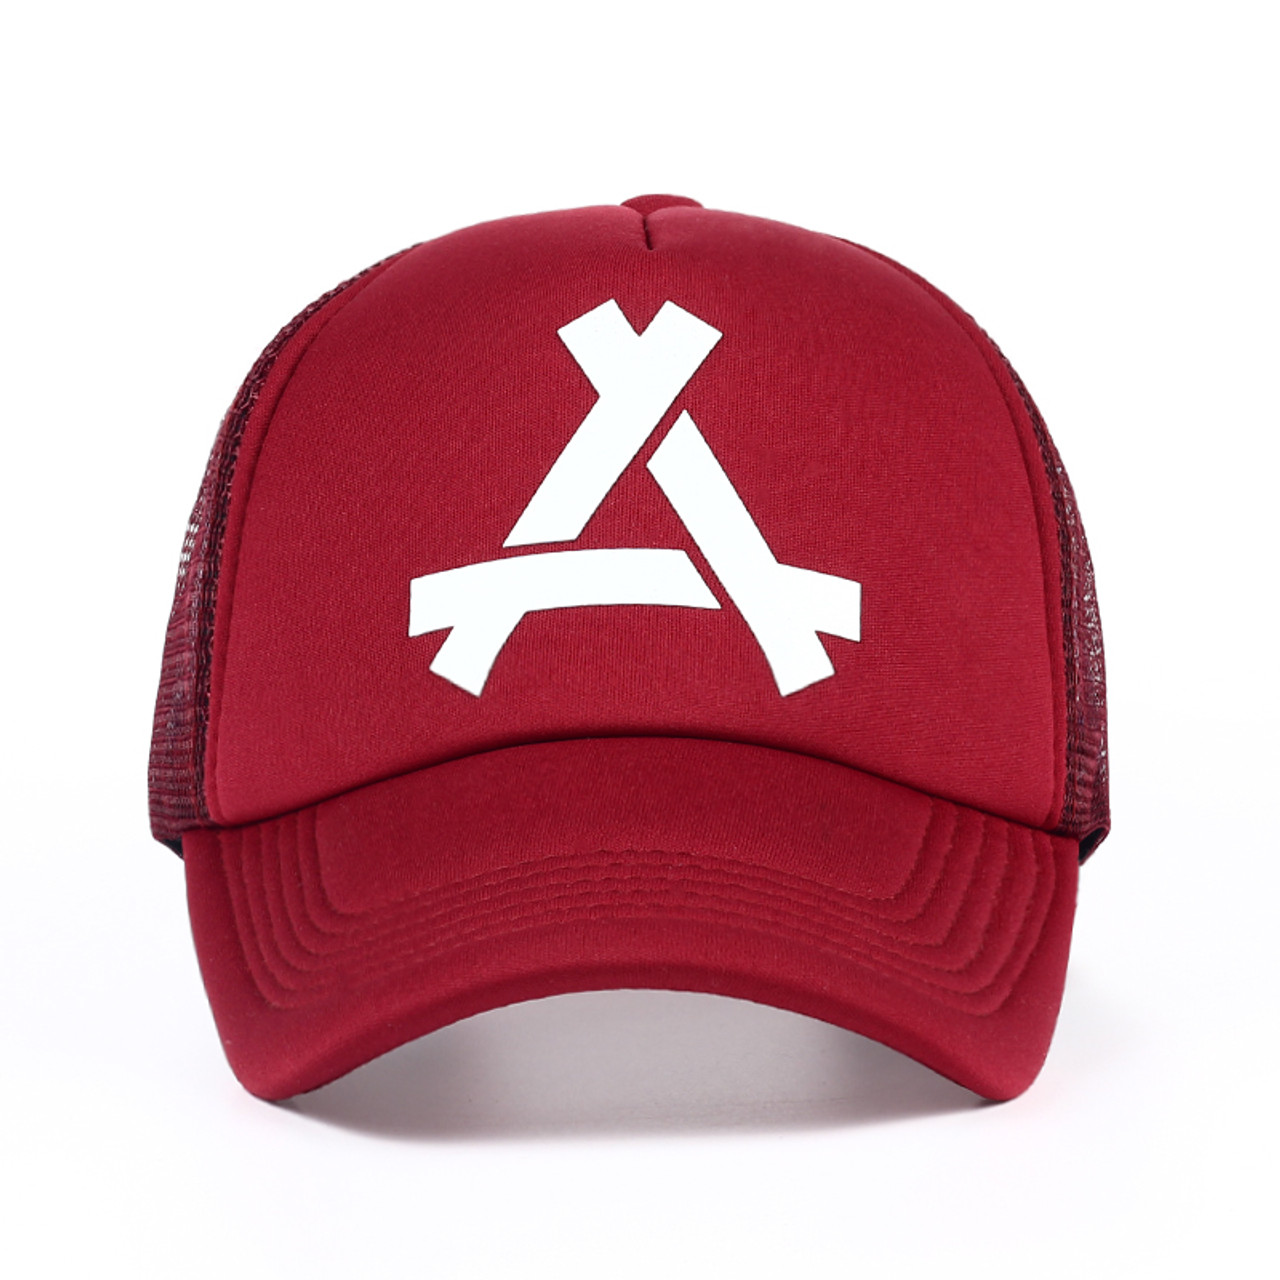 1ec756b2f71 ... VORON 2017 New Summer Baseball Mesh Golf Cap Cap Snapback Hat  Fashionable Polo Sports Hiphop Trucker ...